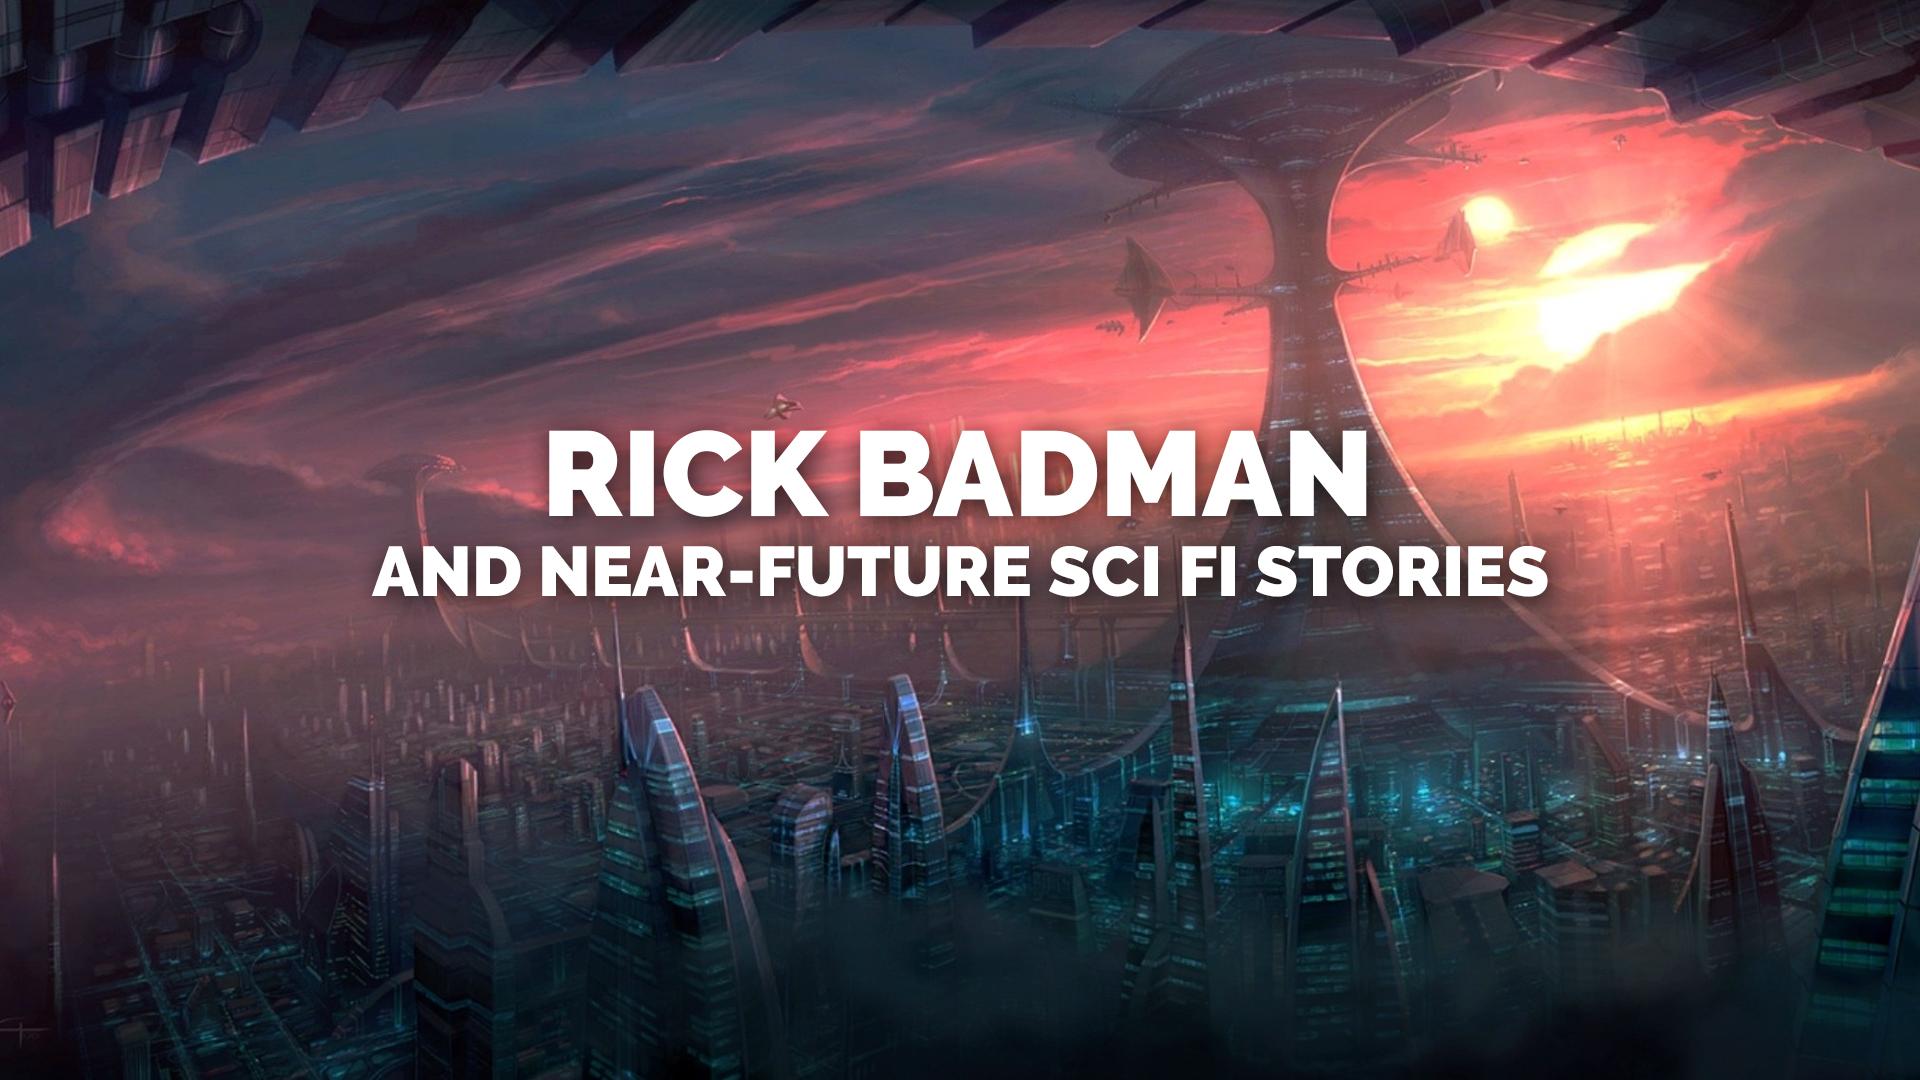 Rick Badman and Near-Future Sci Fi Stories banner